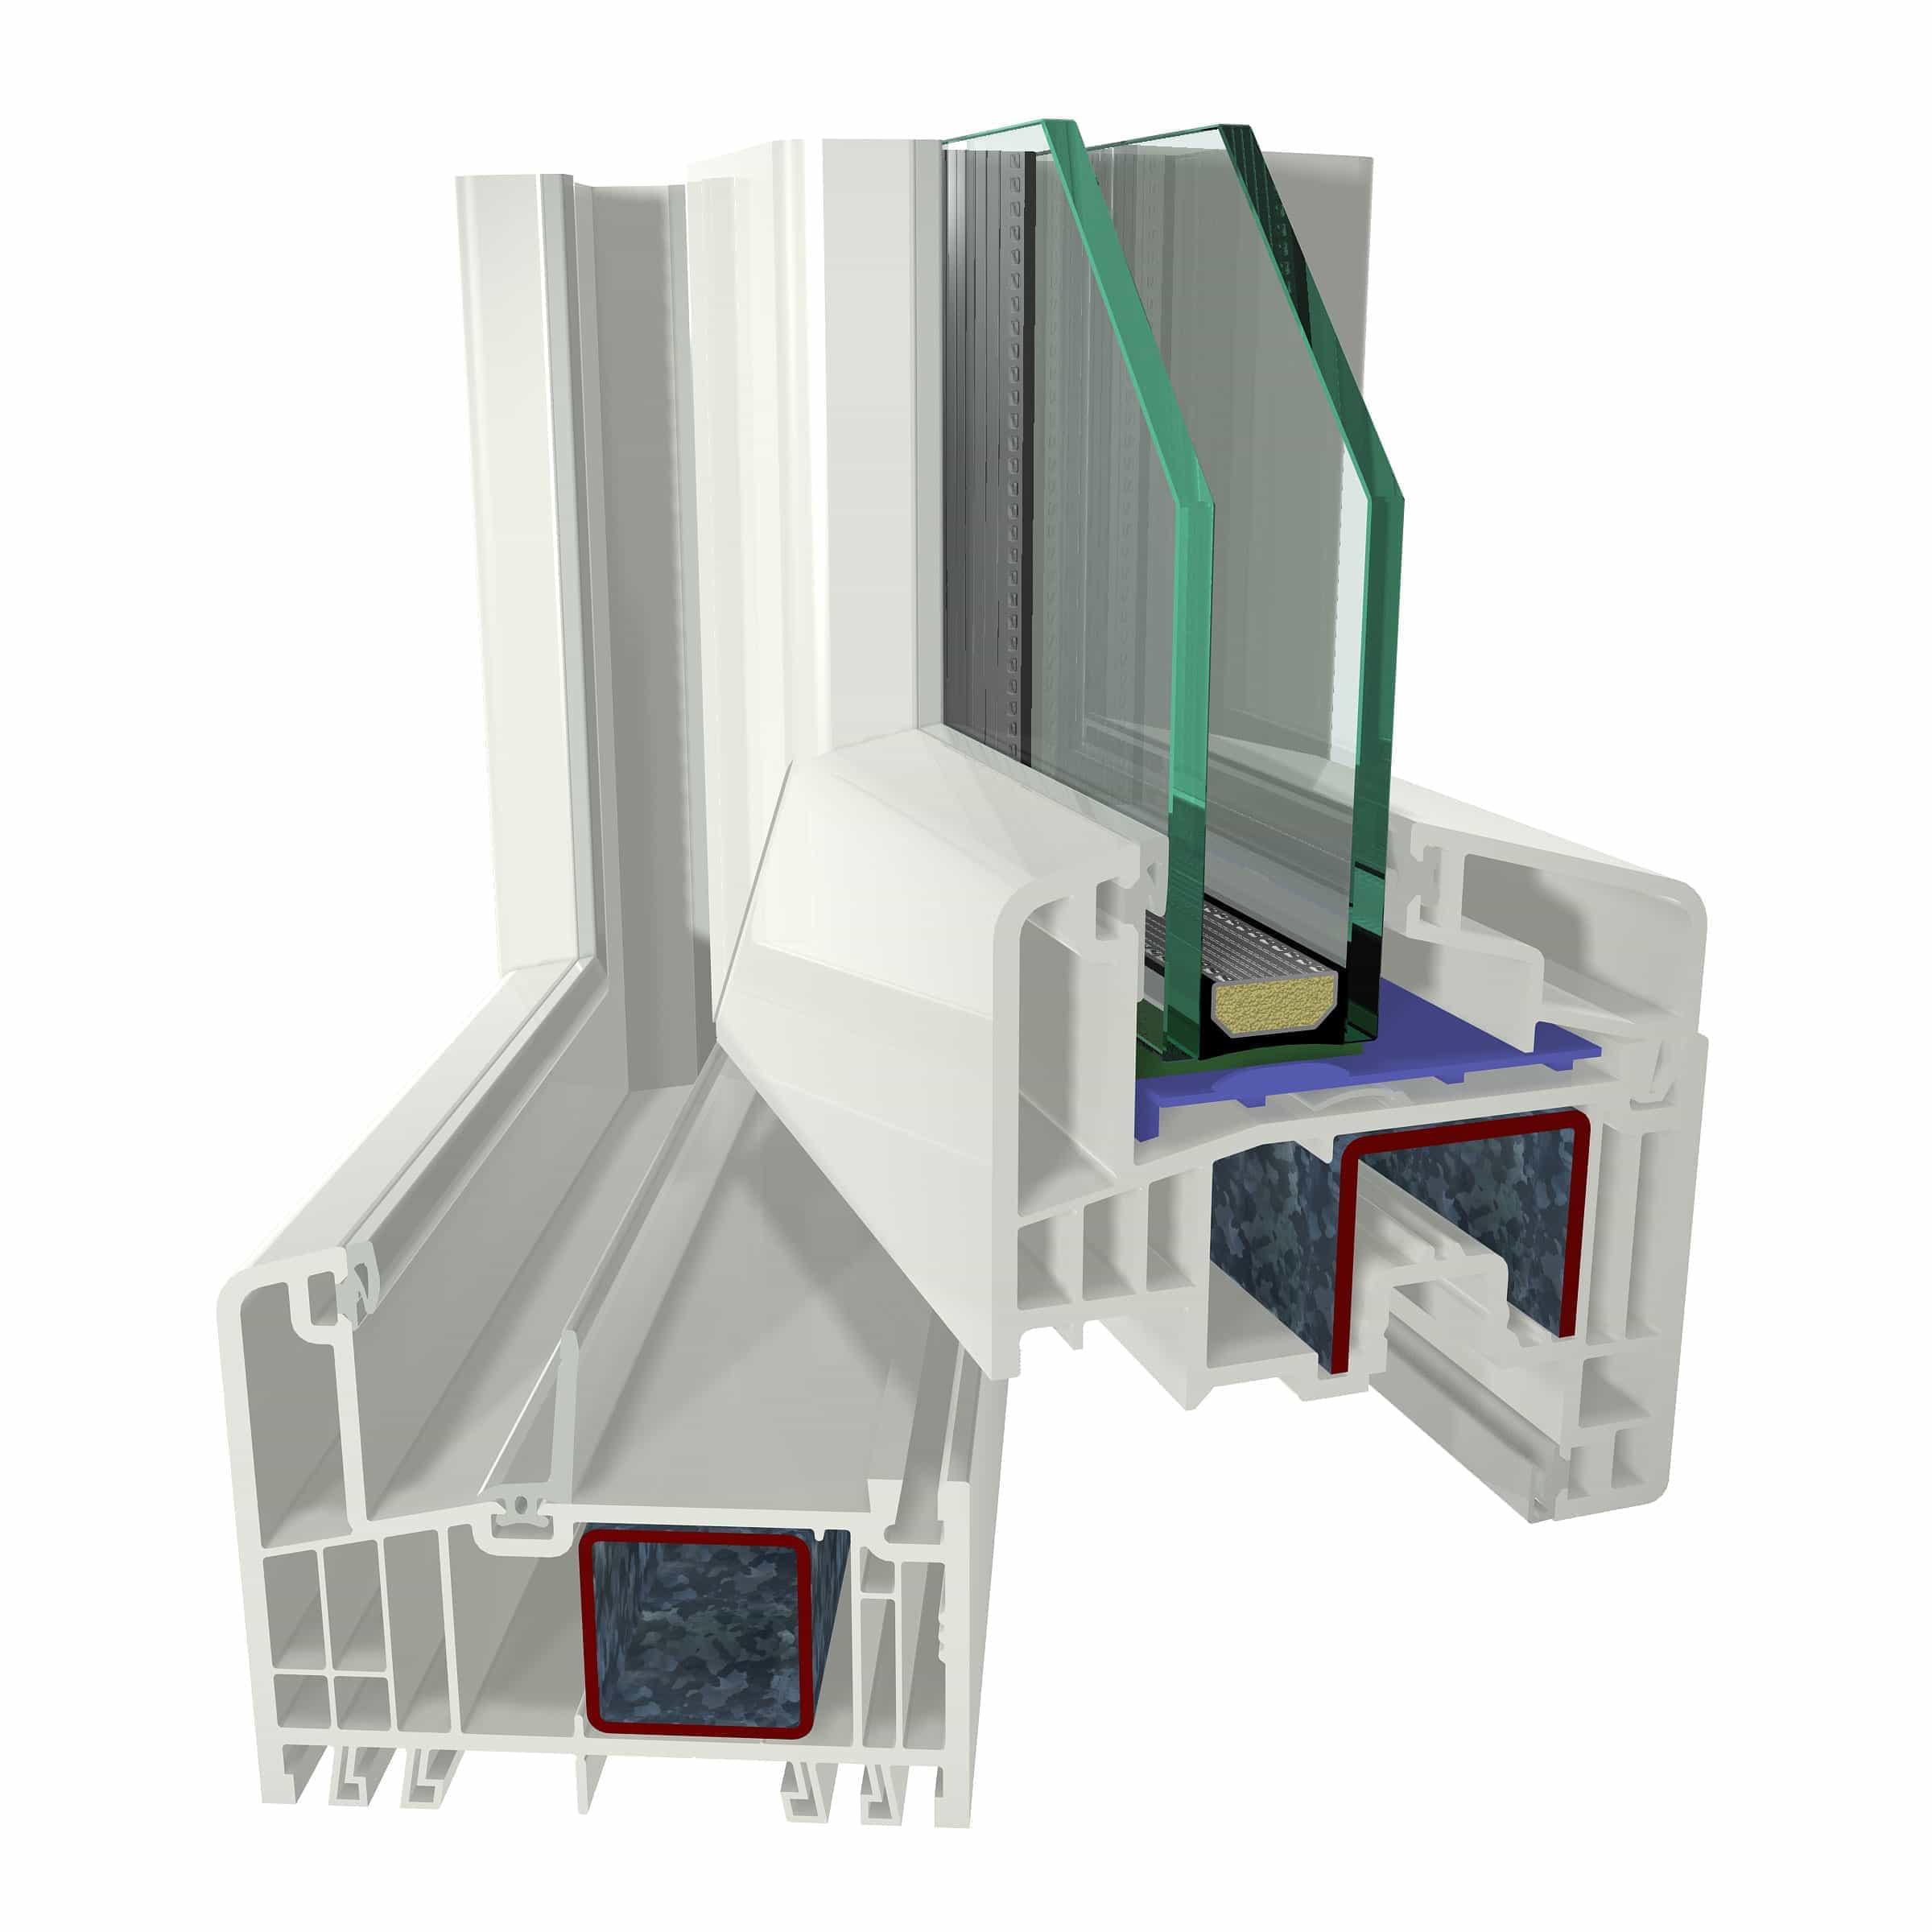 Okna PCV plastikowe z profilem Gealan S9000 - Stolmar